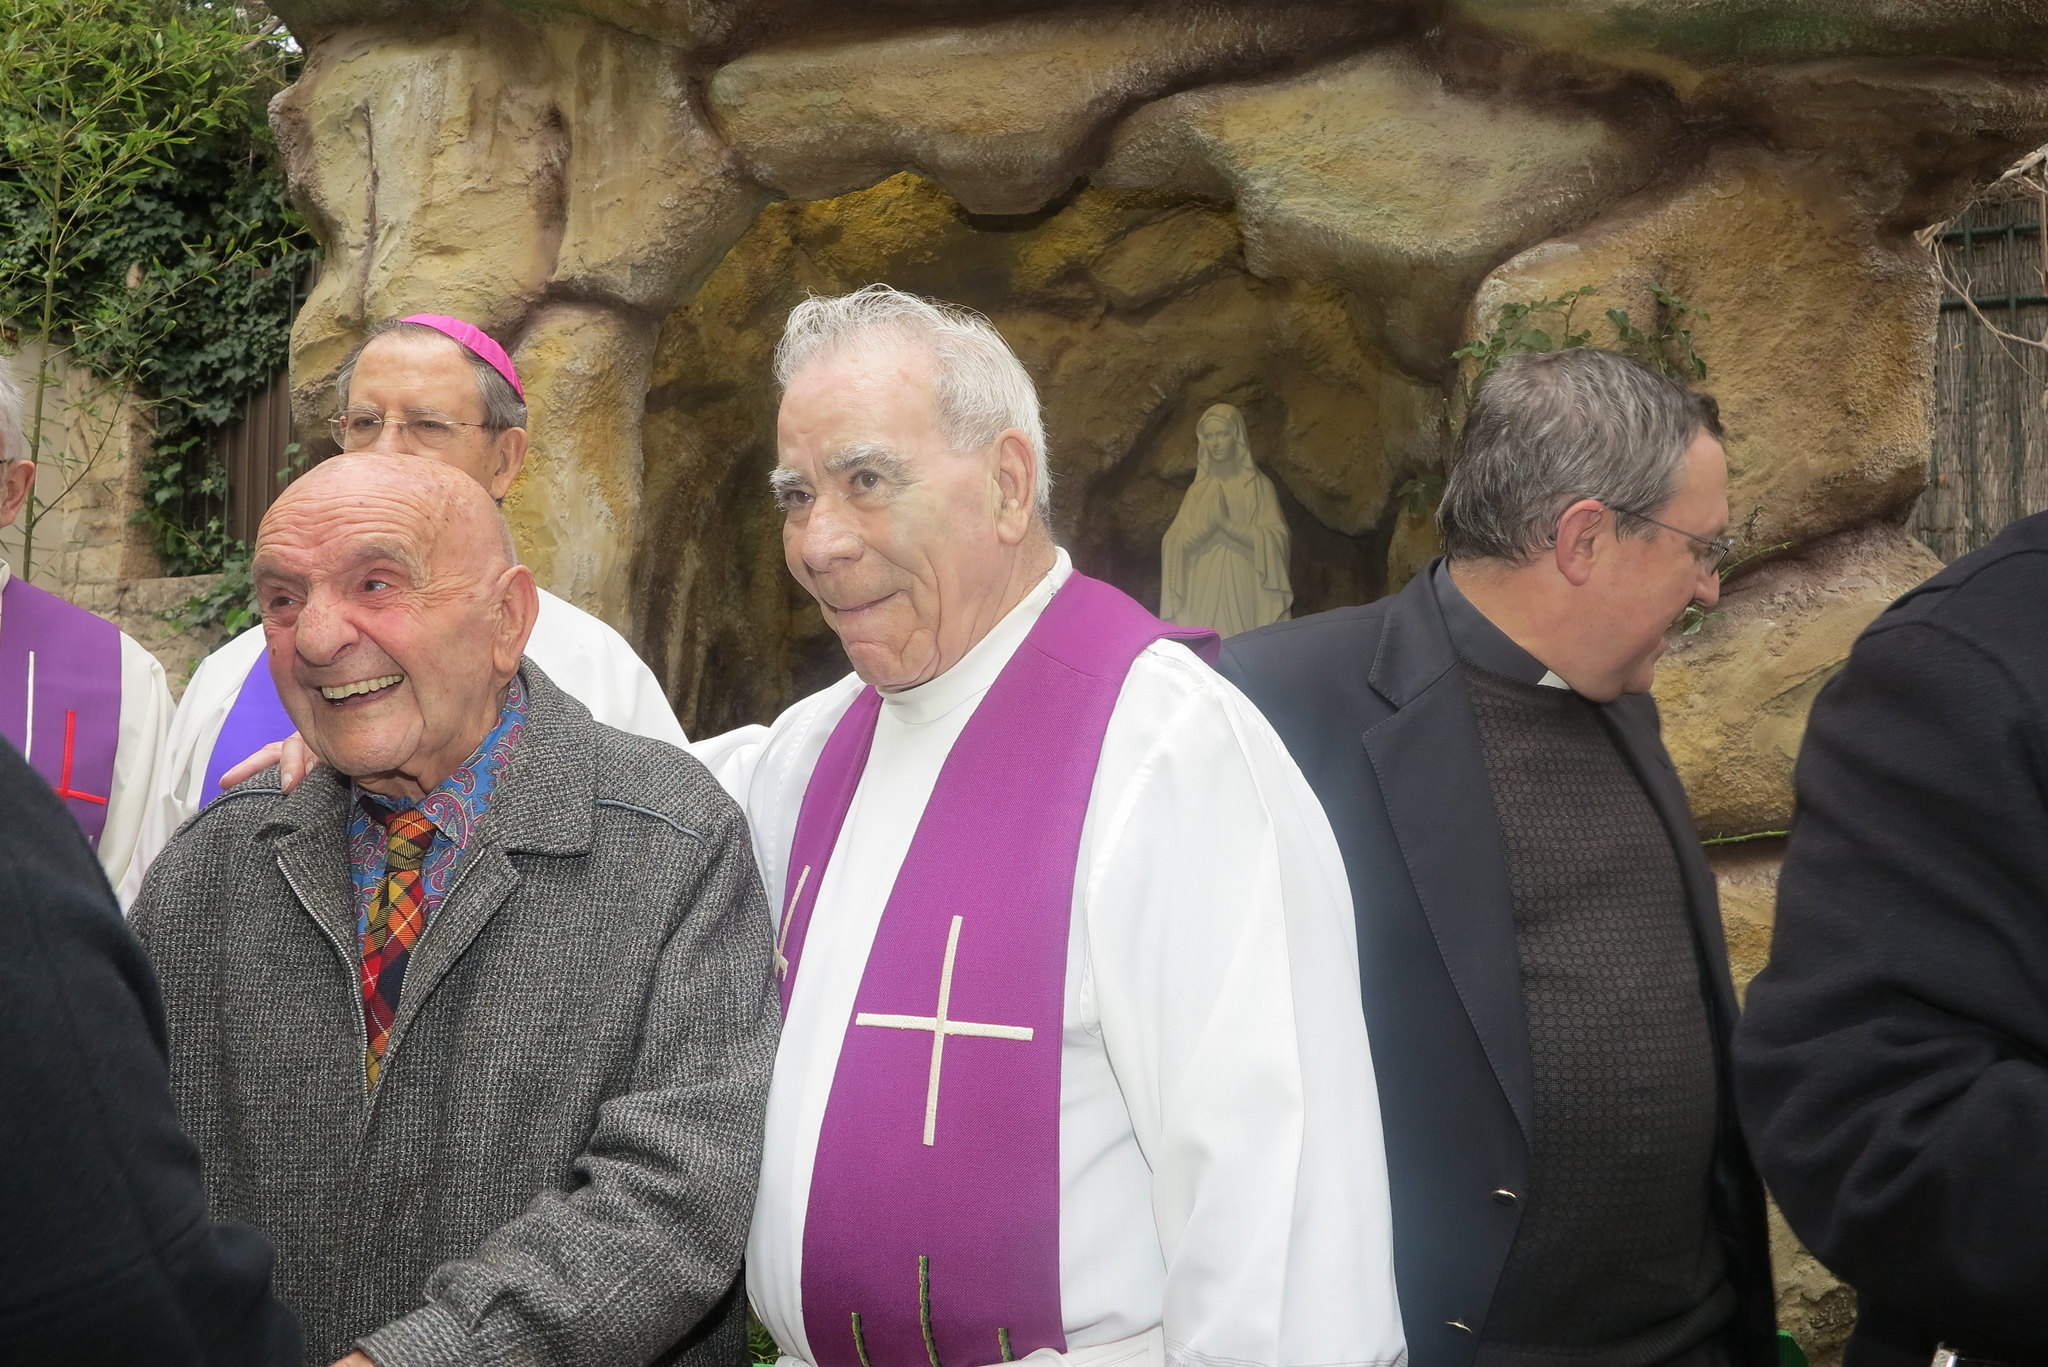 (2016-02-13) - Inauguración Virgen de Lourdes, La Molineta - Archivo La Molineta 2 (61)